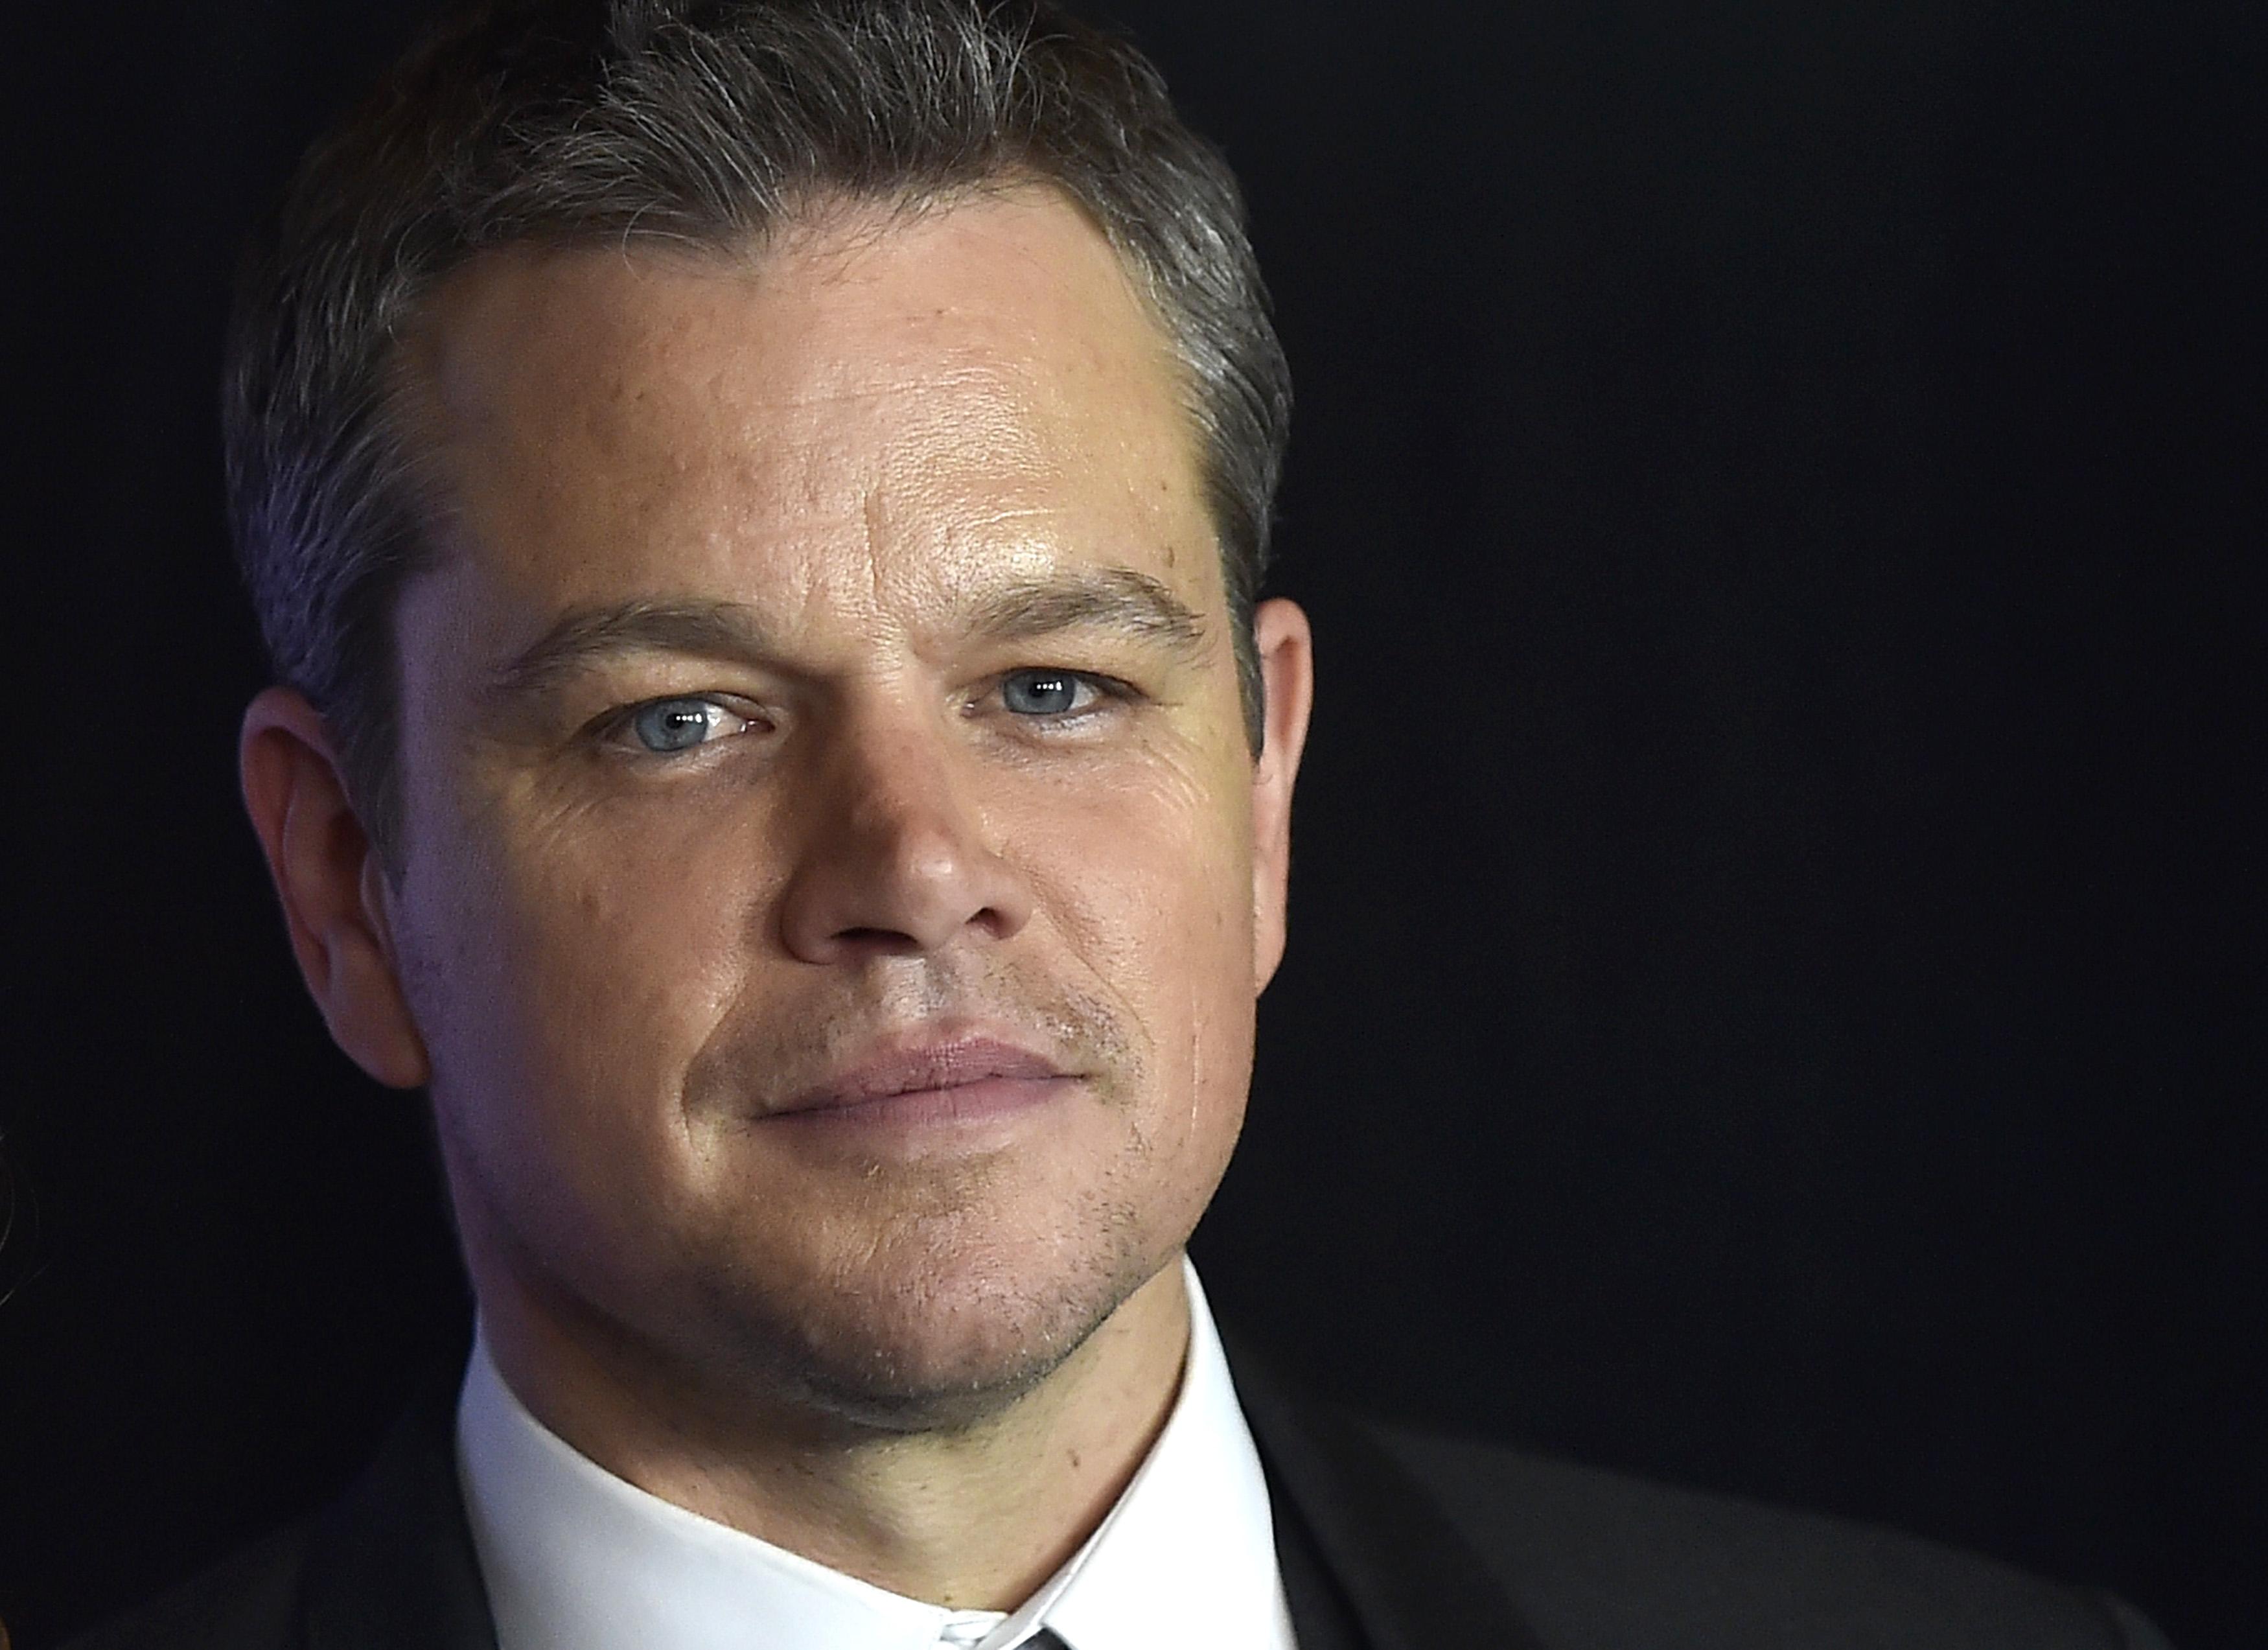 Jason Bourne star Matt Damon explains why you're seeing less indie movies in cinemas